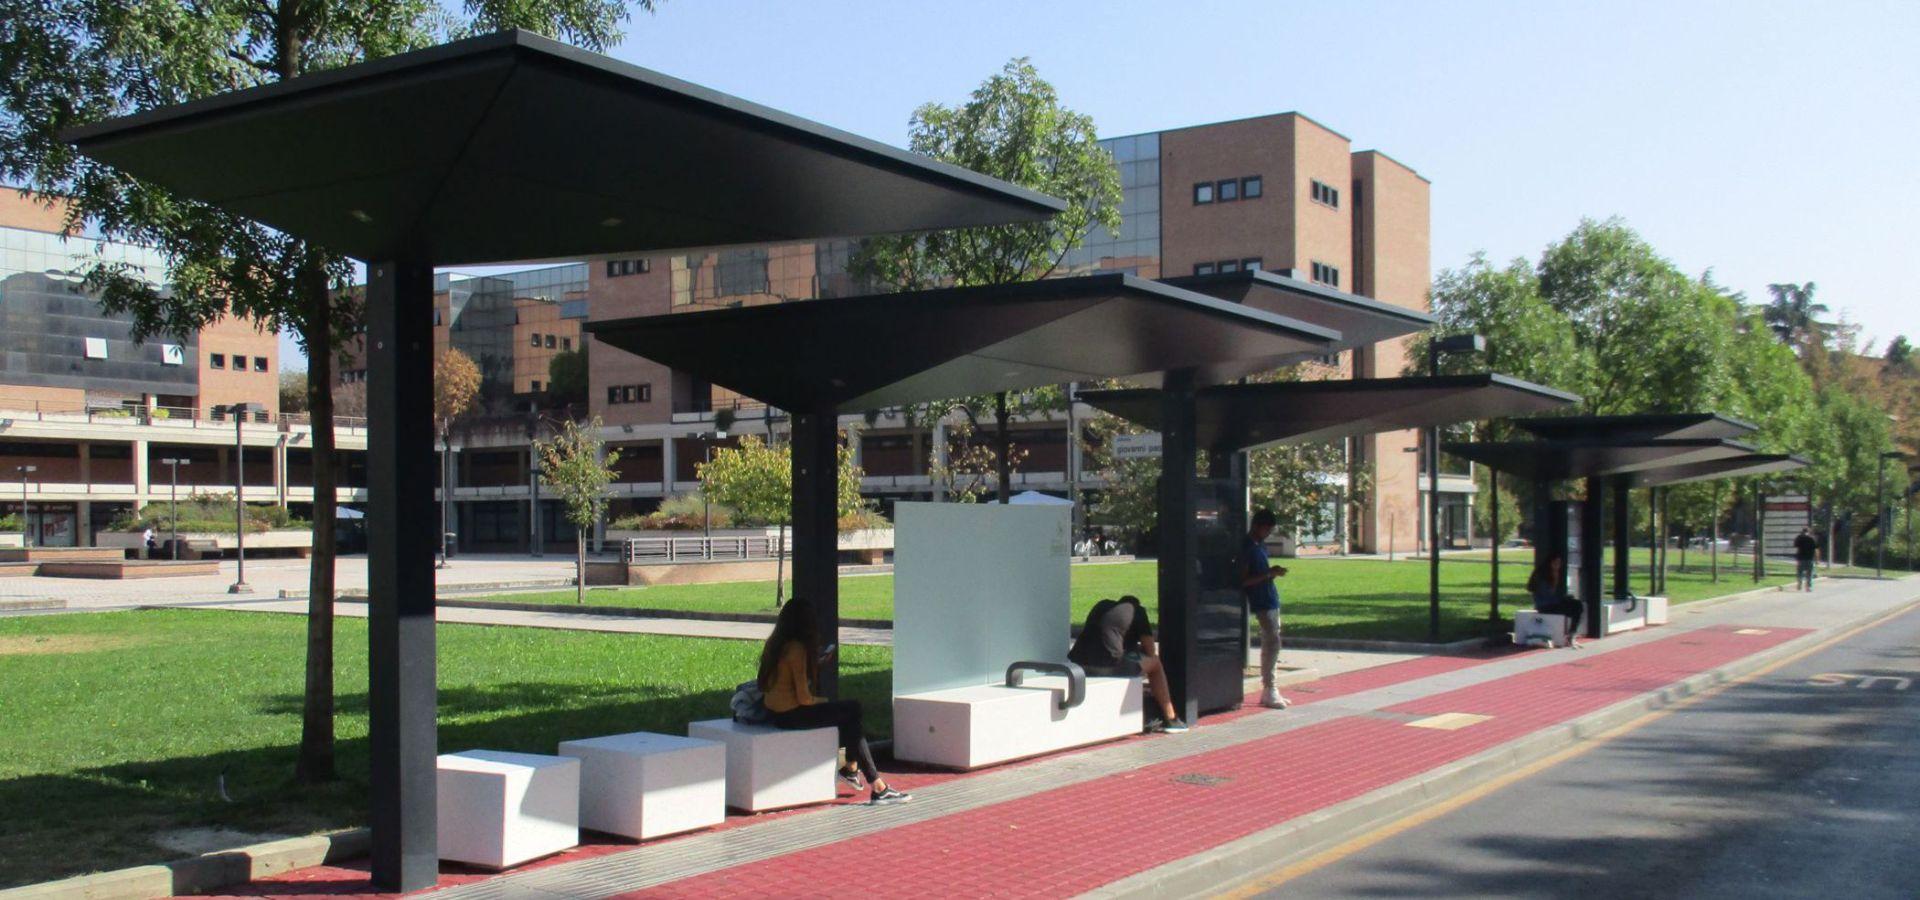 GPDUE abris voyageurs design│METALCO fabricant mobilier urbain